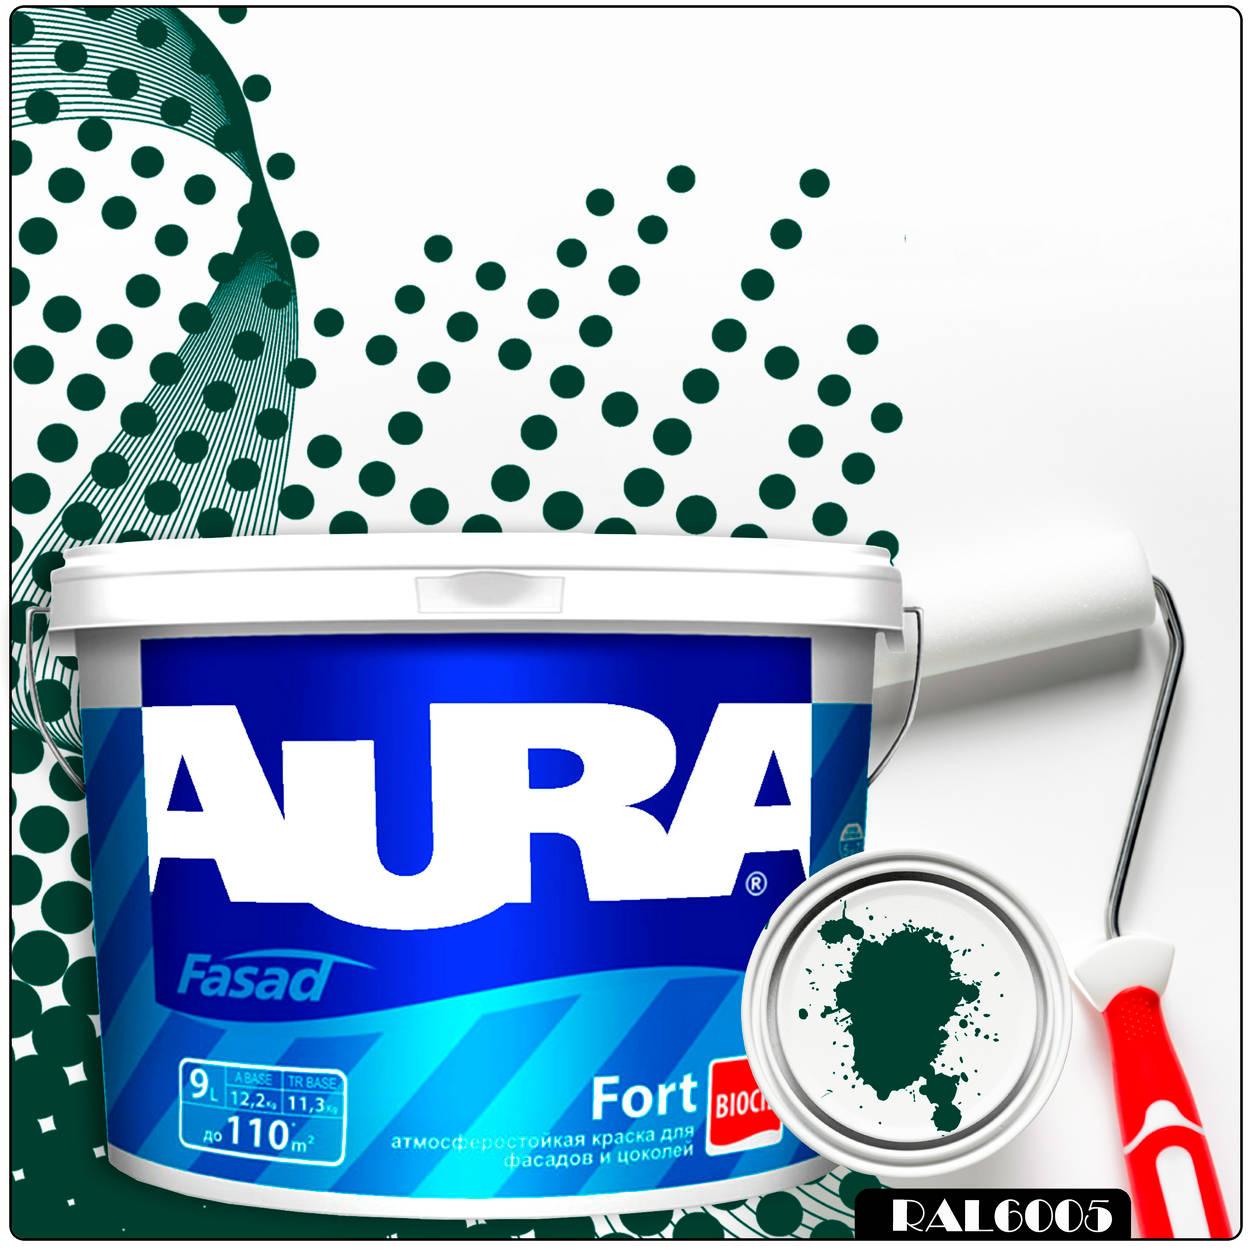 Фото 6 - Краска Aura Fasad Fort, RAL 6005 Зеленый мох, латексная, матовая, для фасада и цоколей, 9л, Аура.